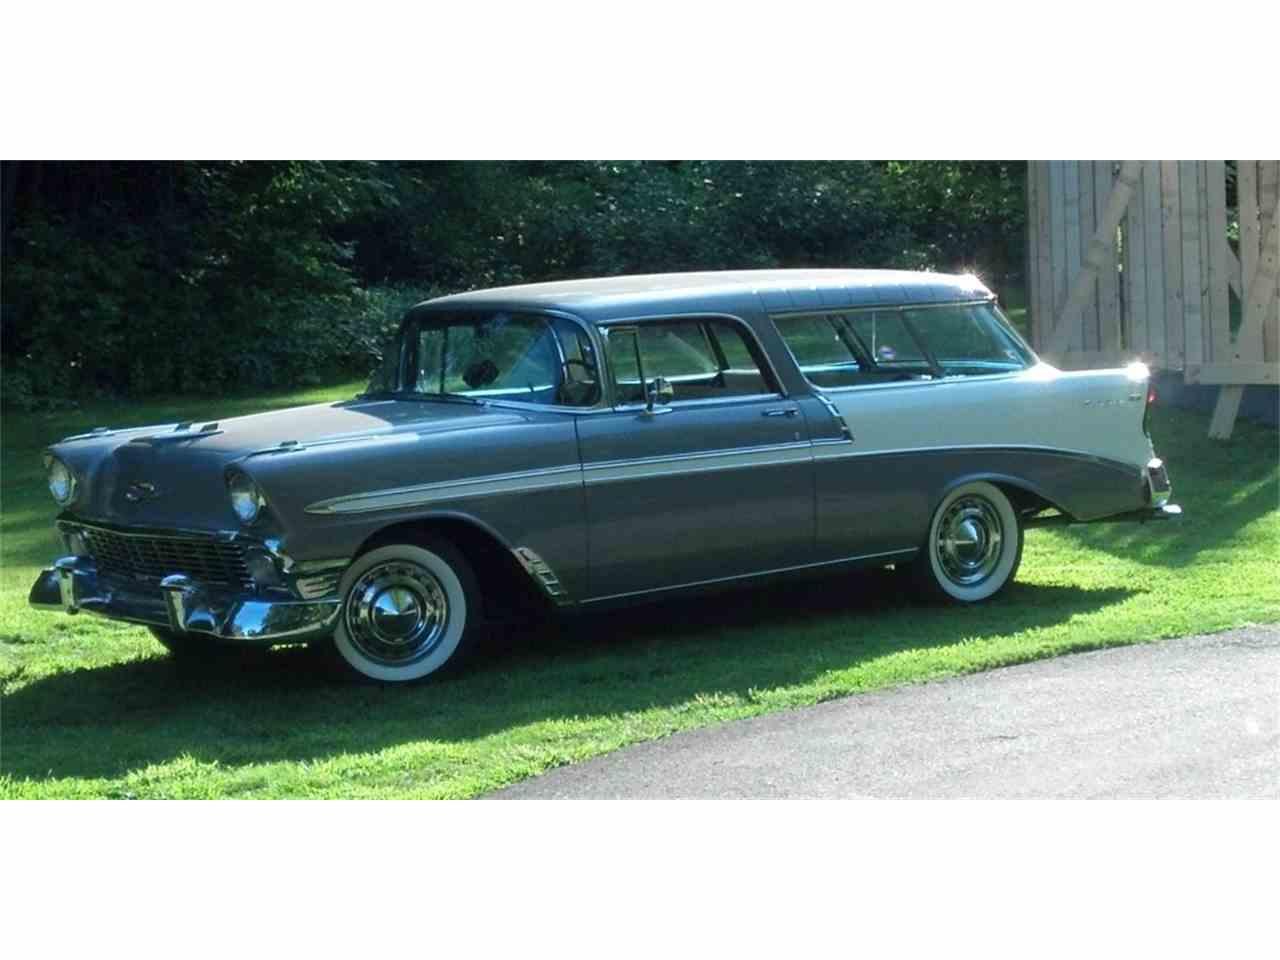 1956 Chevrolet Nomad for Sale | ClassicCars.com | CC-1061971